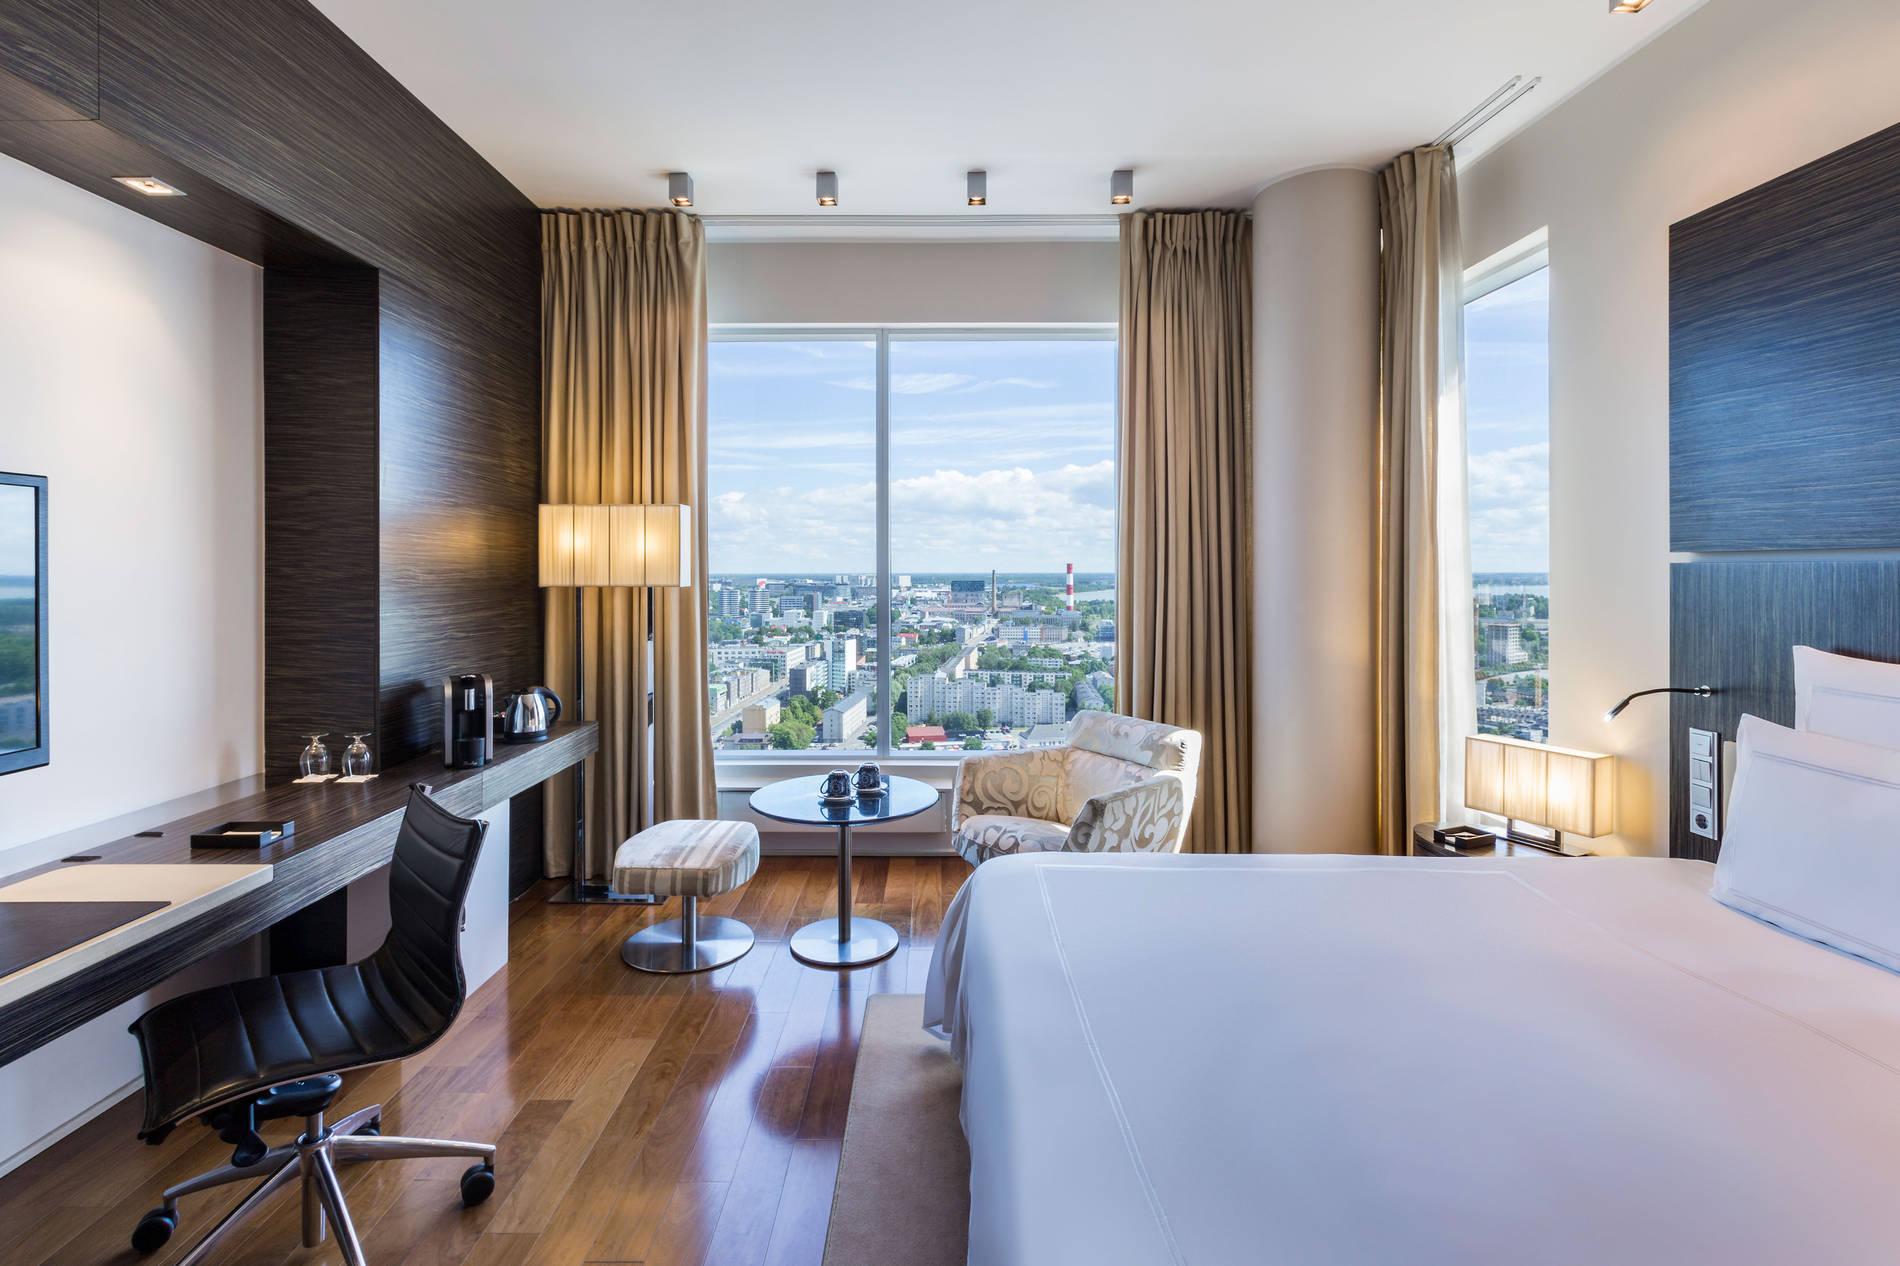 Swissotel_room_2019